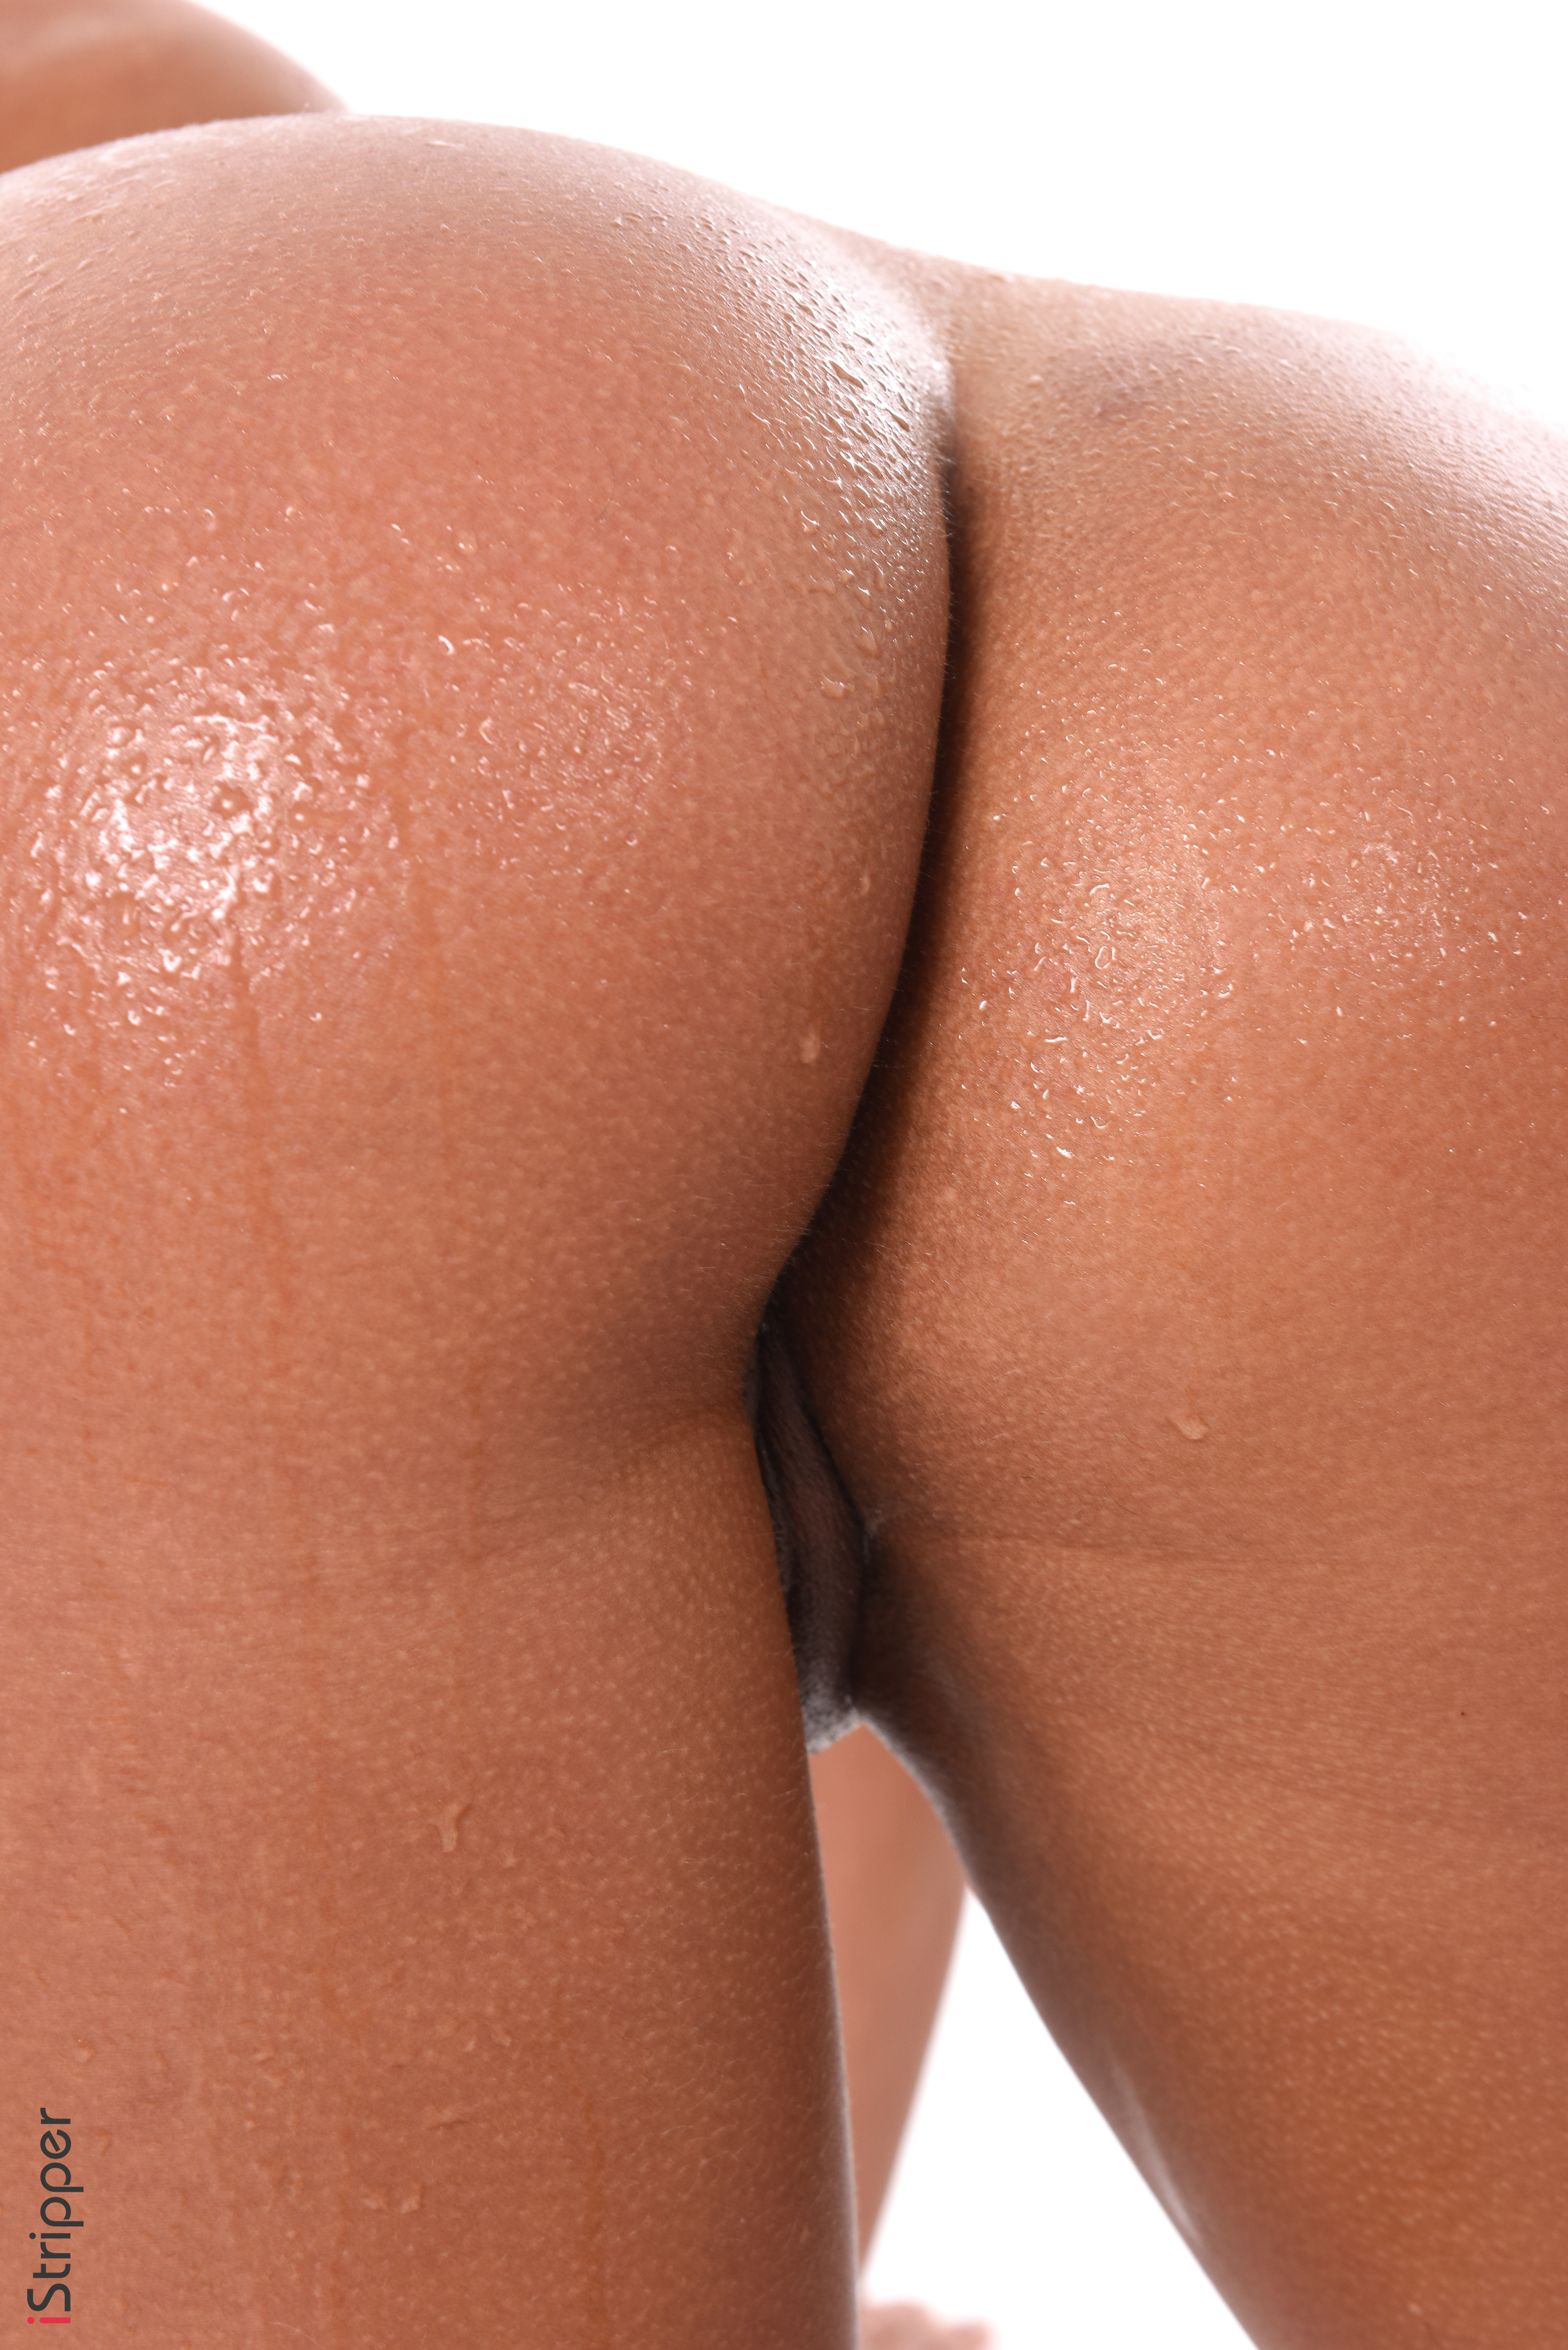 free erotic xxx website wallpaper silhouette